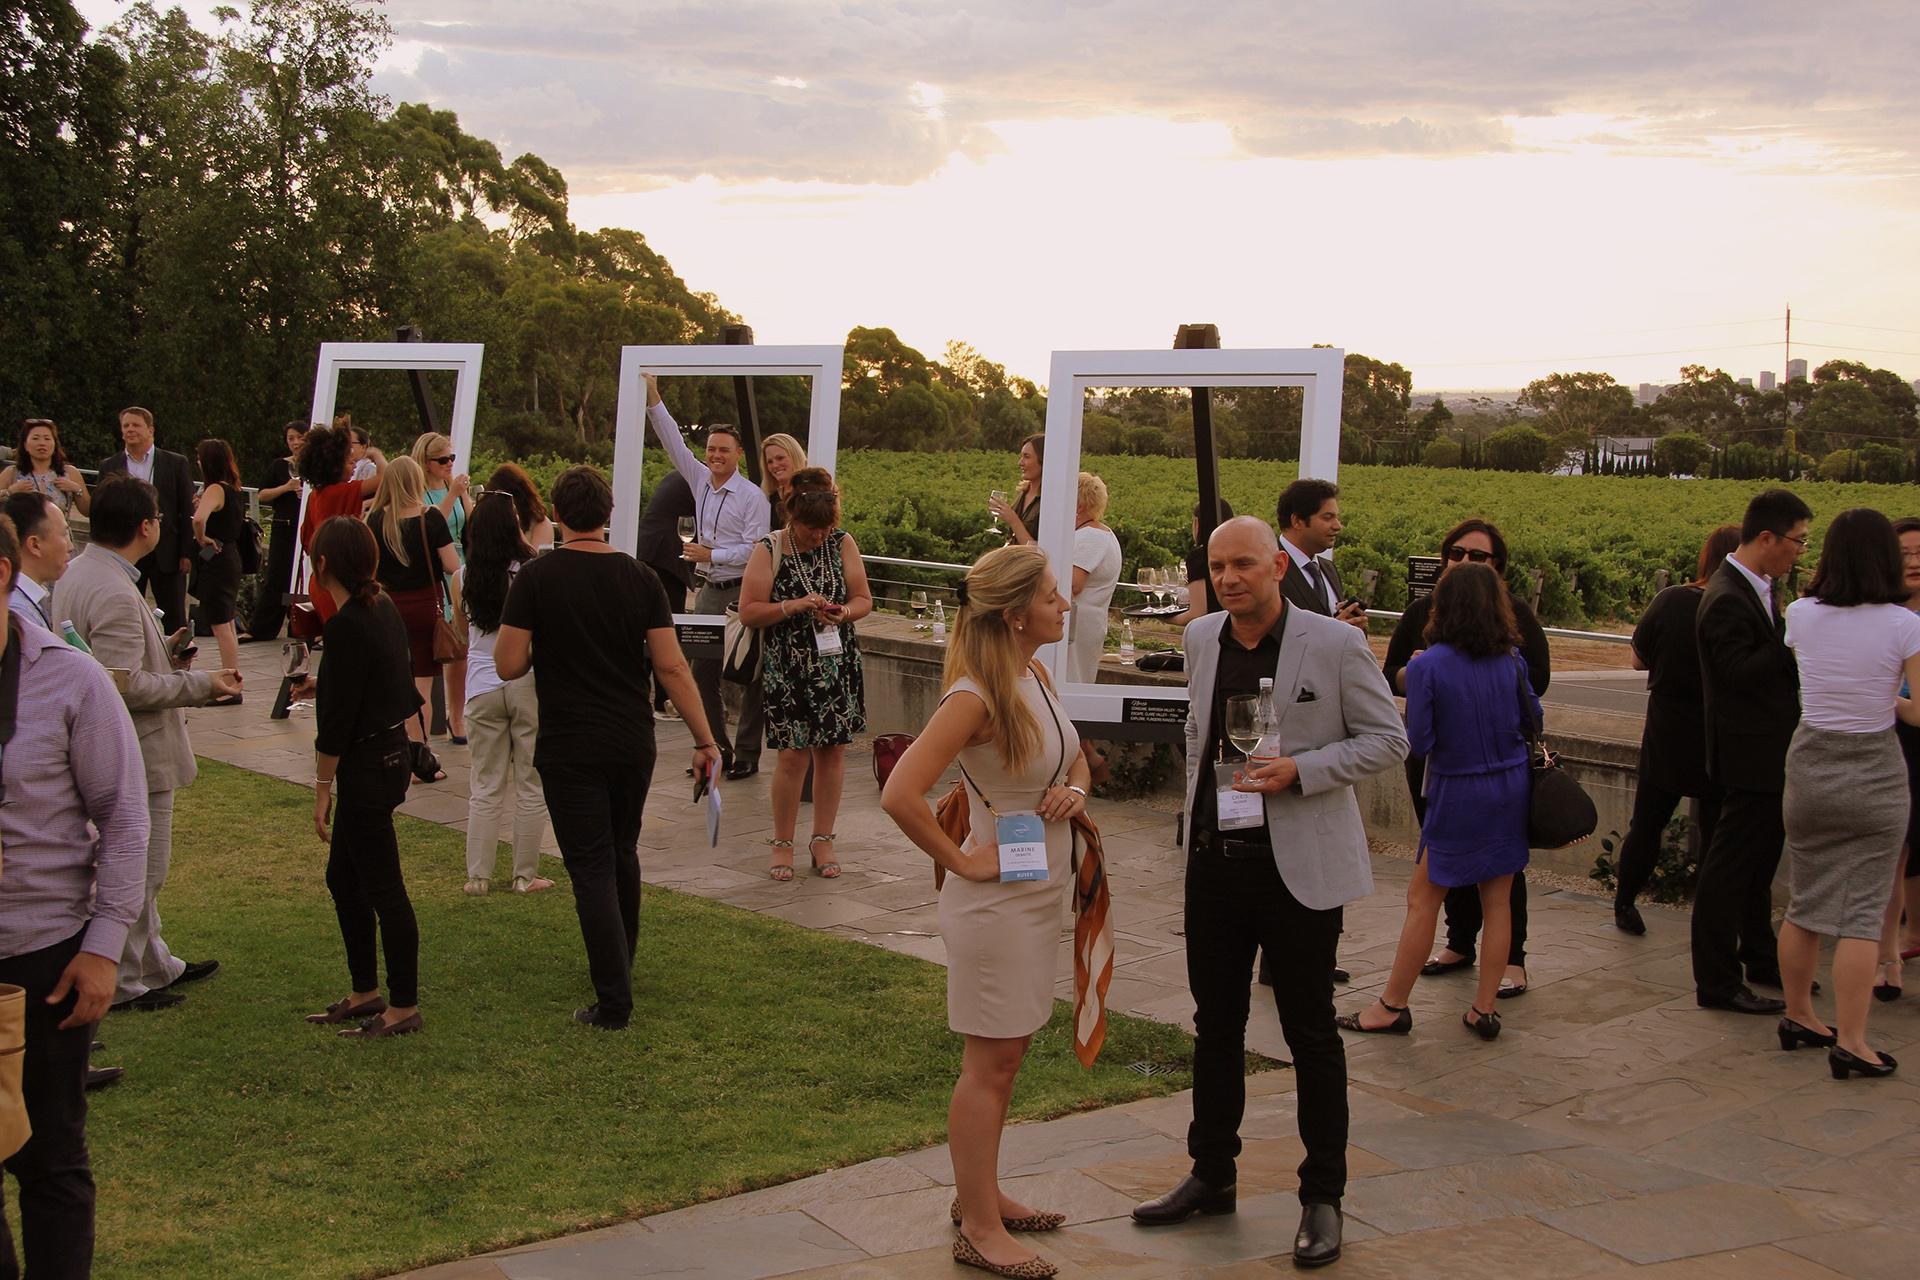 Lumino-Tourism-Australia-Dreamtime-Welcome-Reception-04.jpg